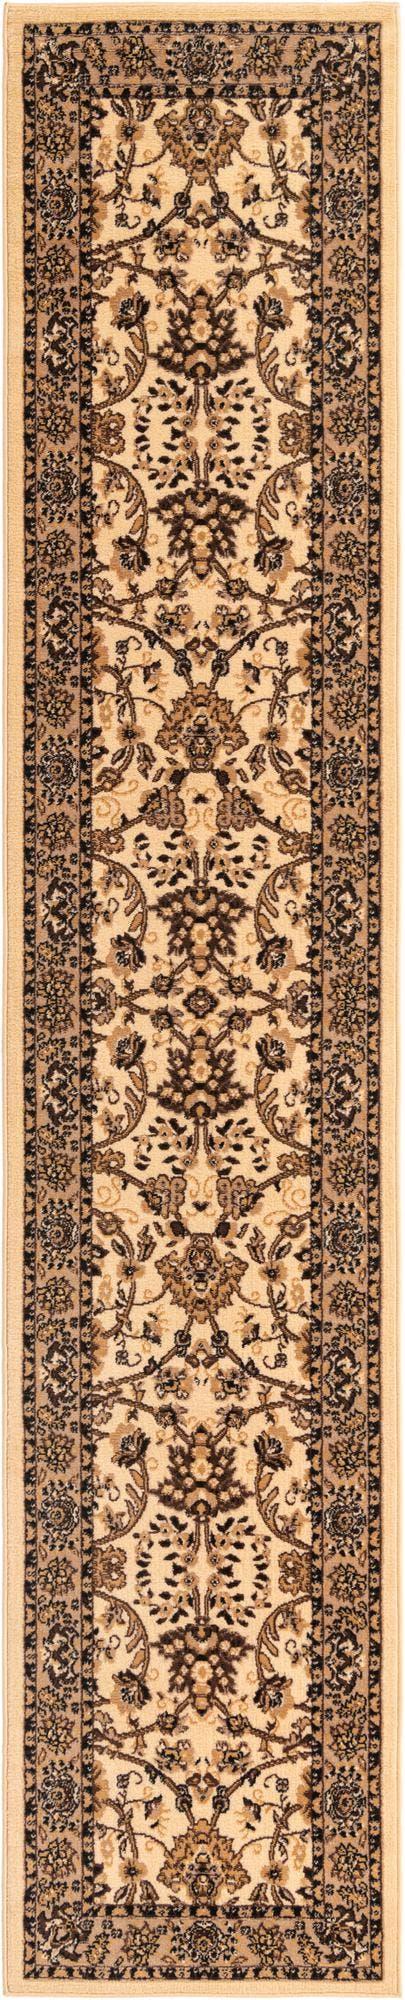 2' 7 x 13' Kashan Design Runner Rug main image